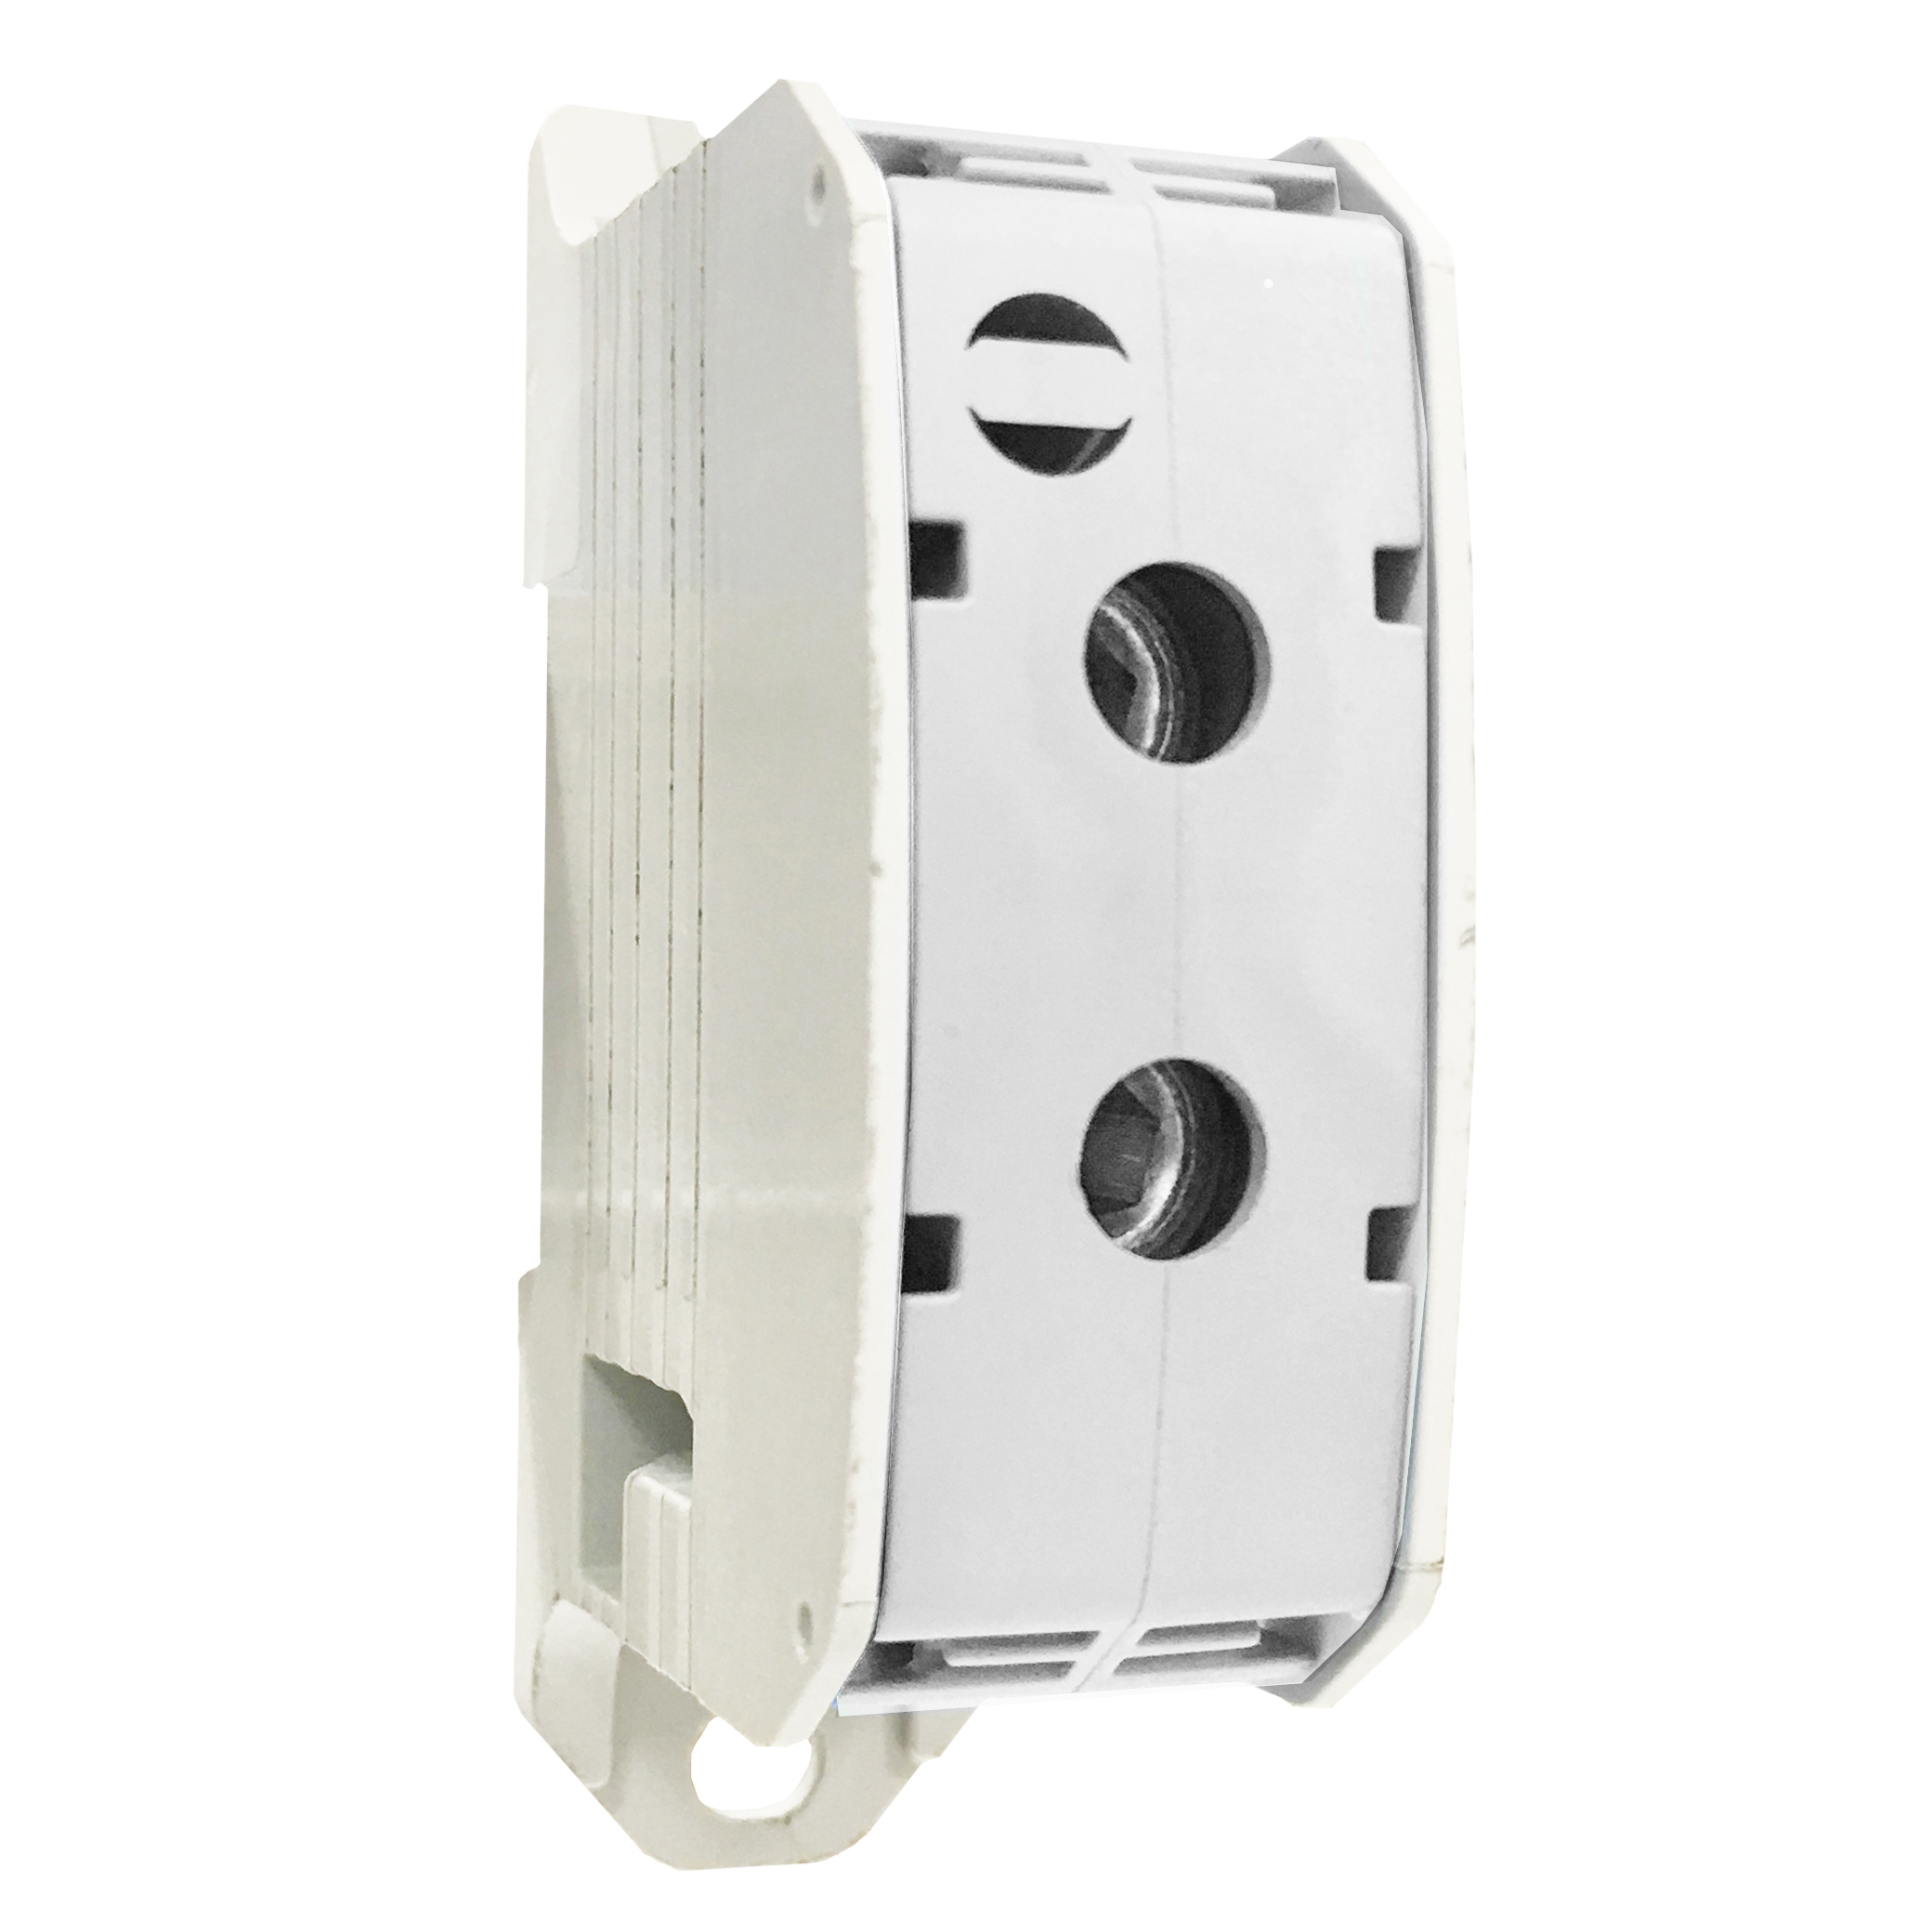 1 Stk Aluminium /Kupfer Klemme, 1-polig, 50mm² grau IKA21310--